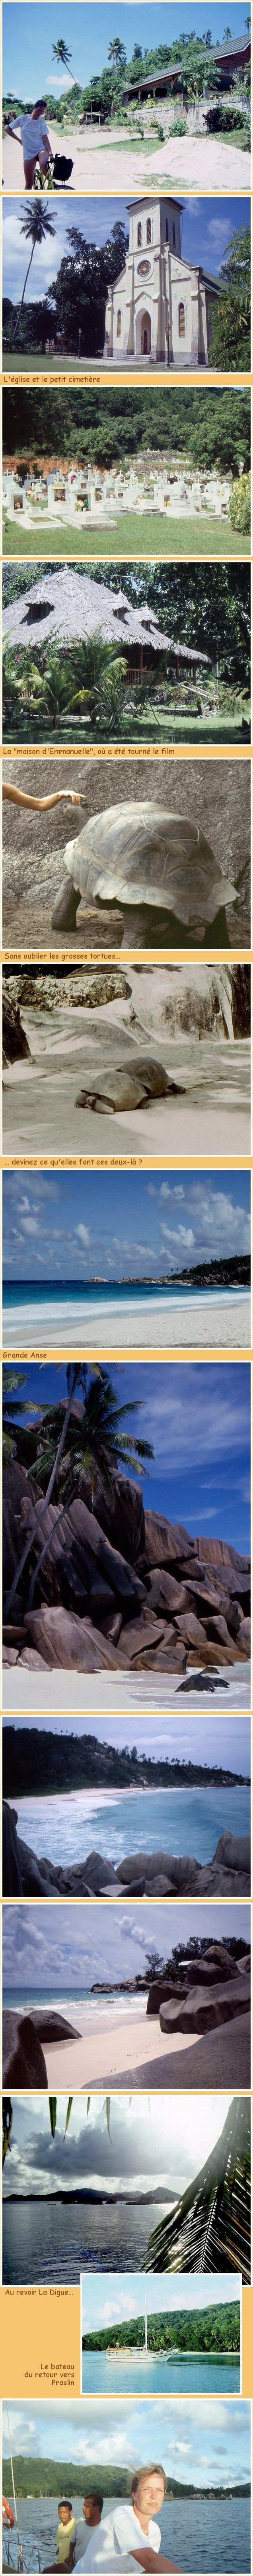 Les Seychelles - 9